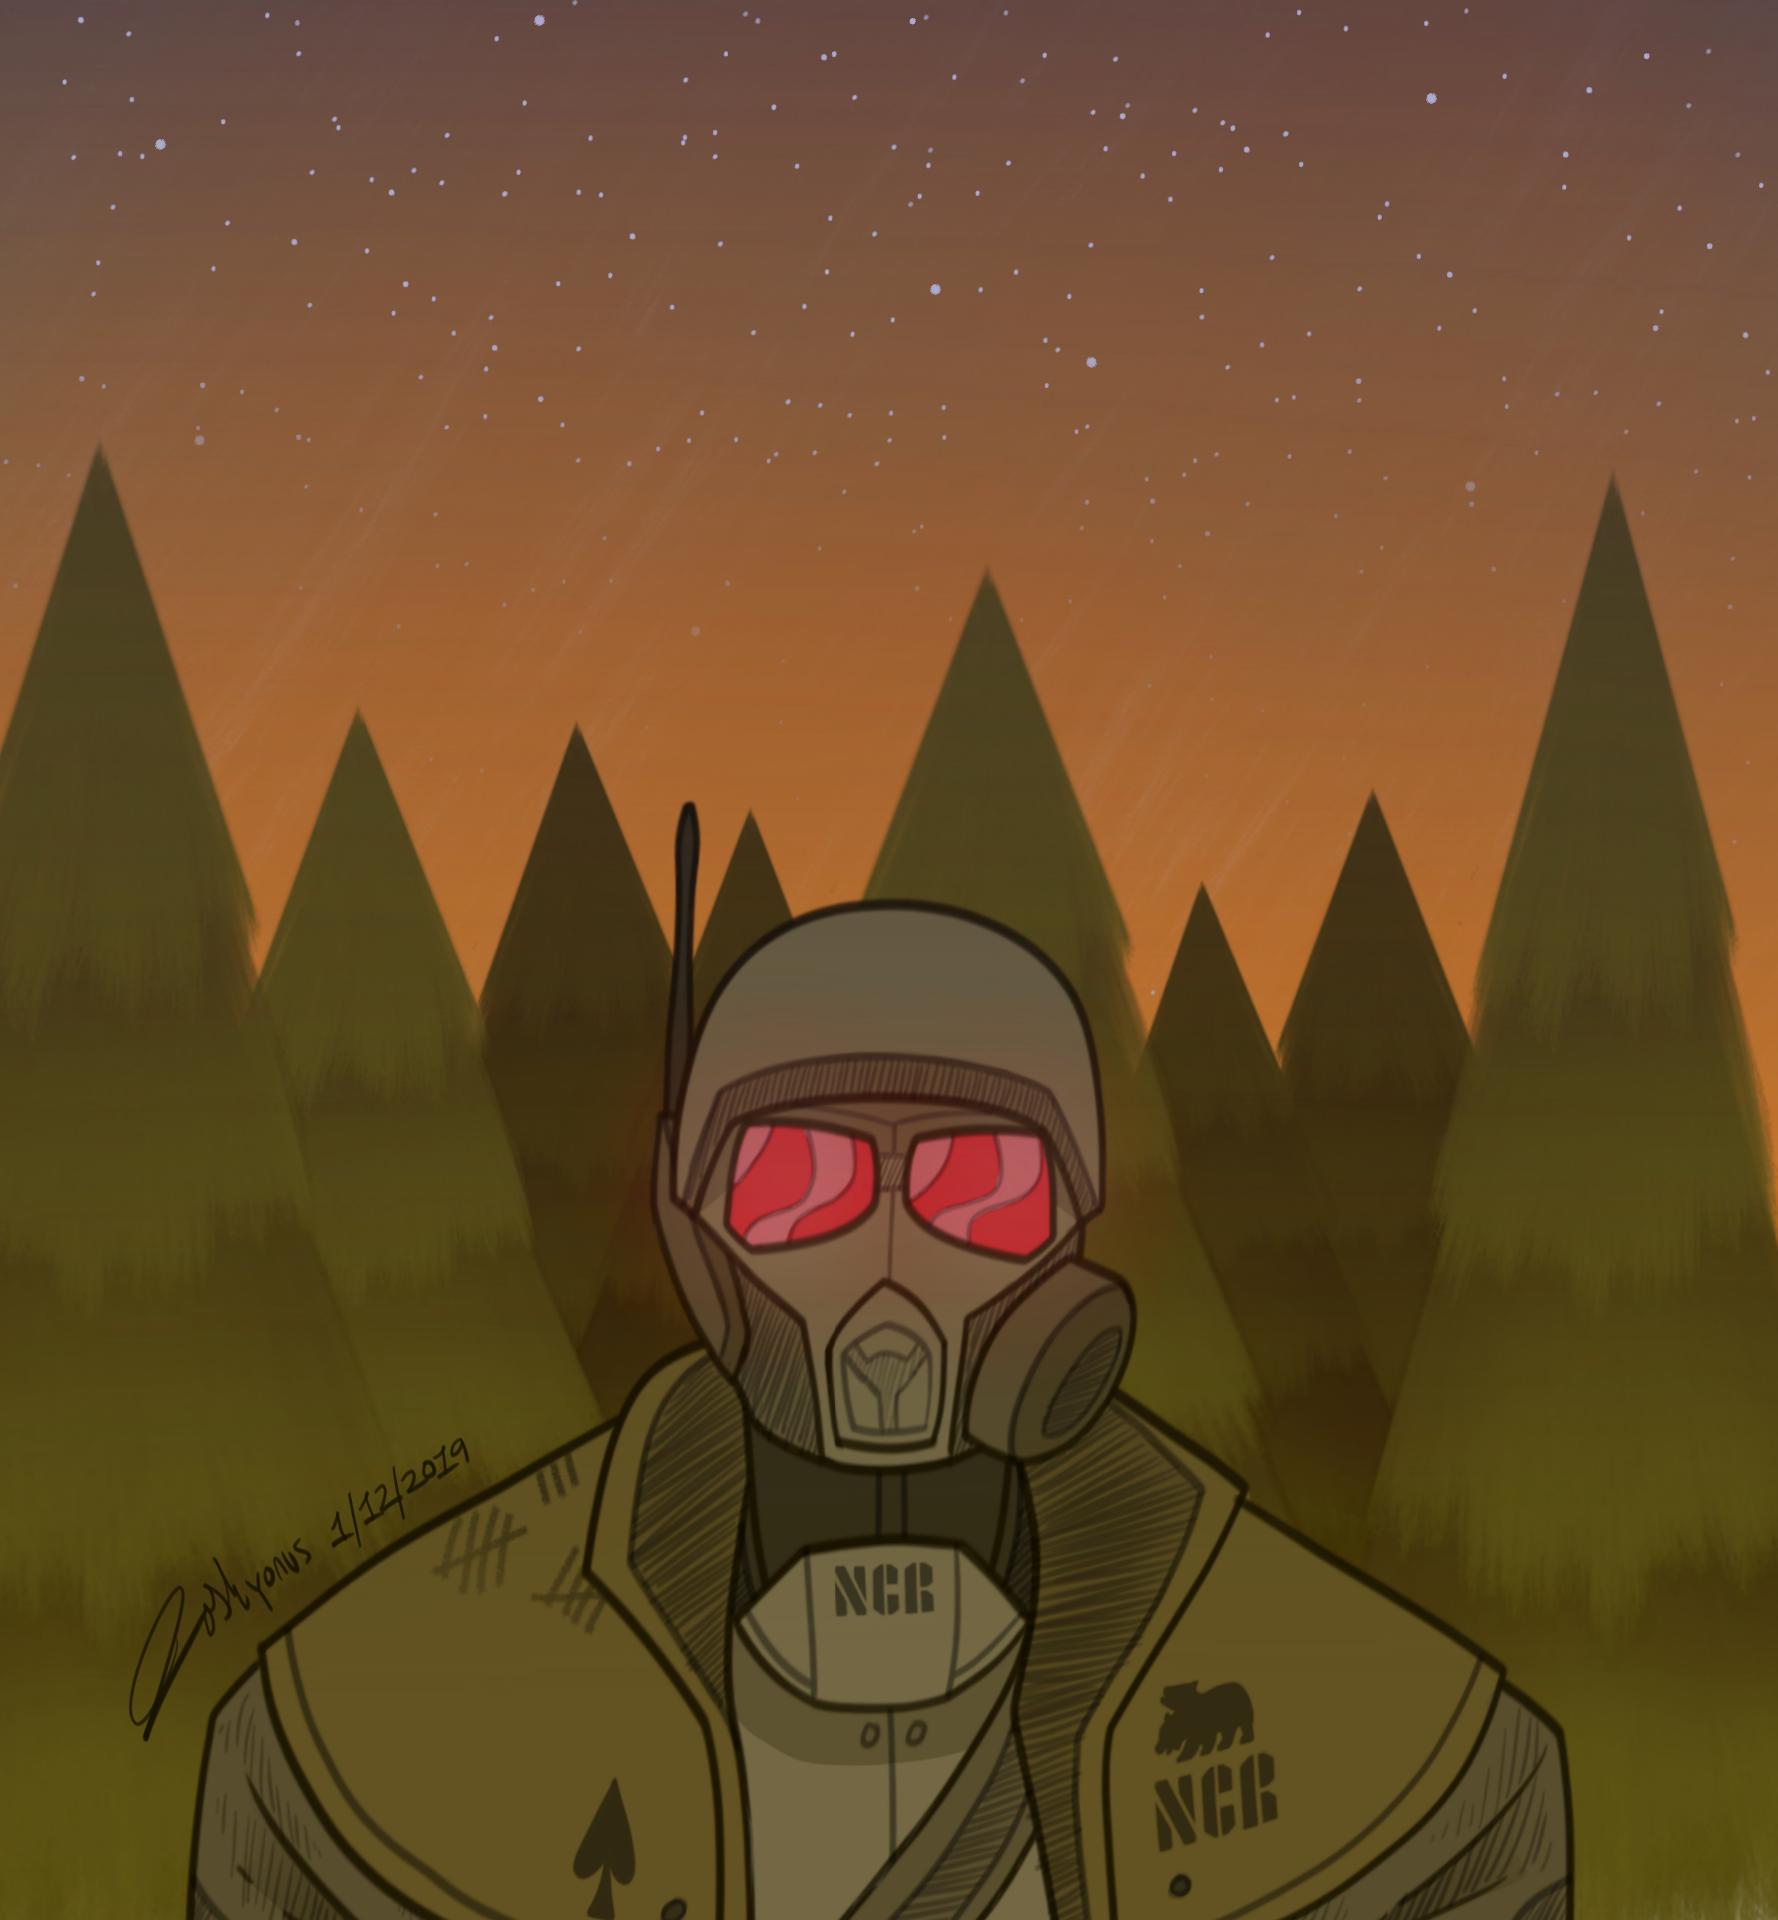 NCR Ranger in Zion